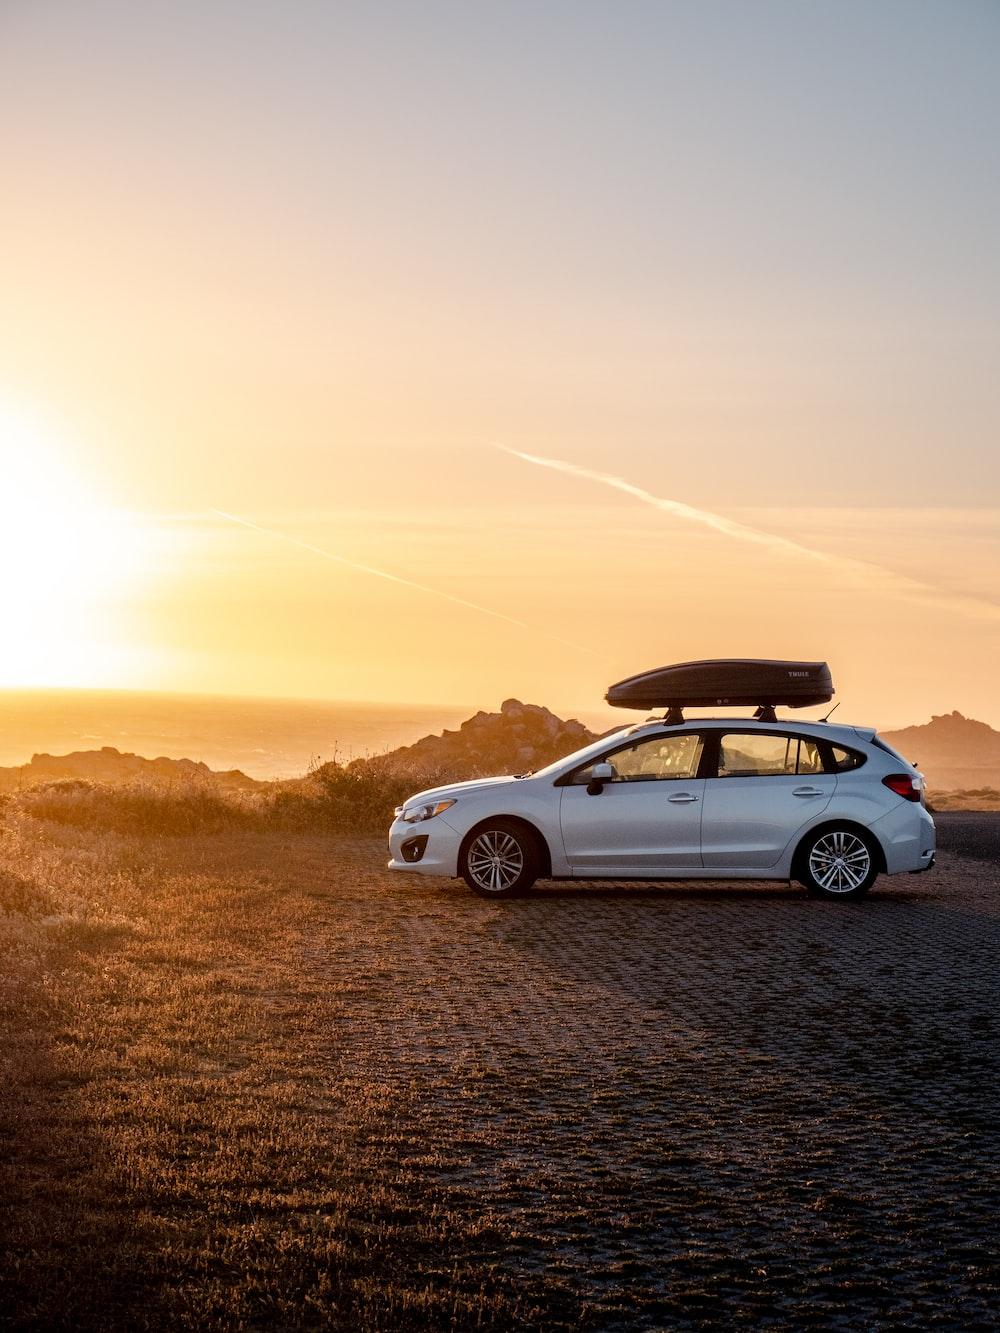 white chevrolet camaro on road during sunset